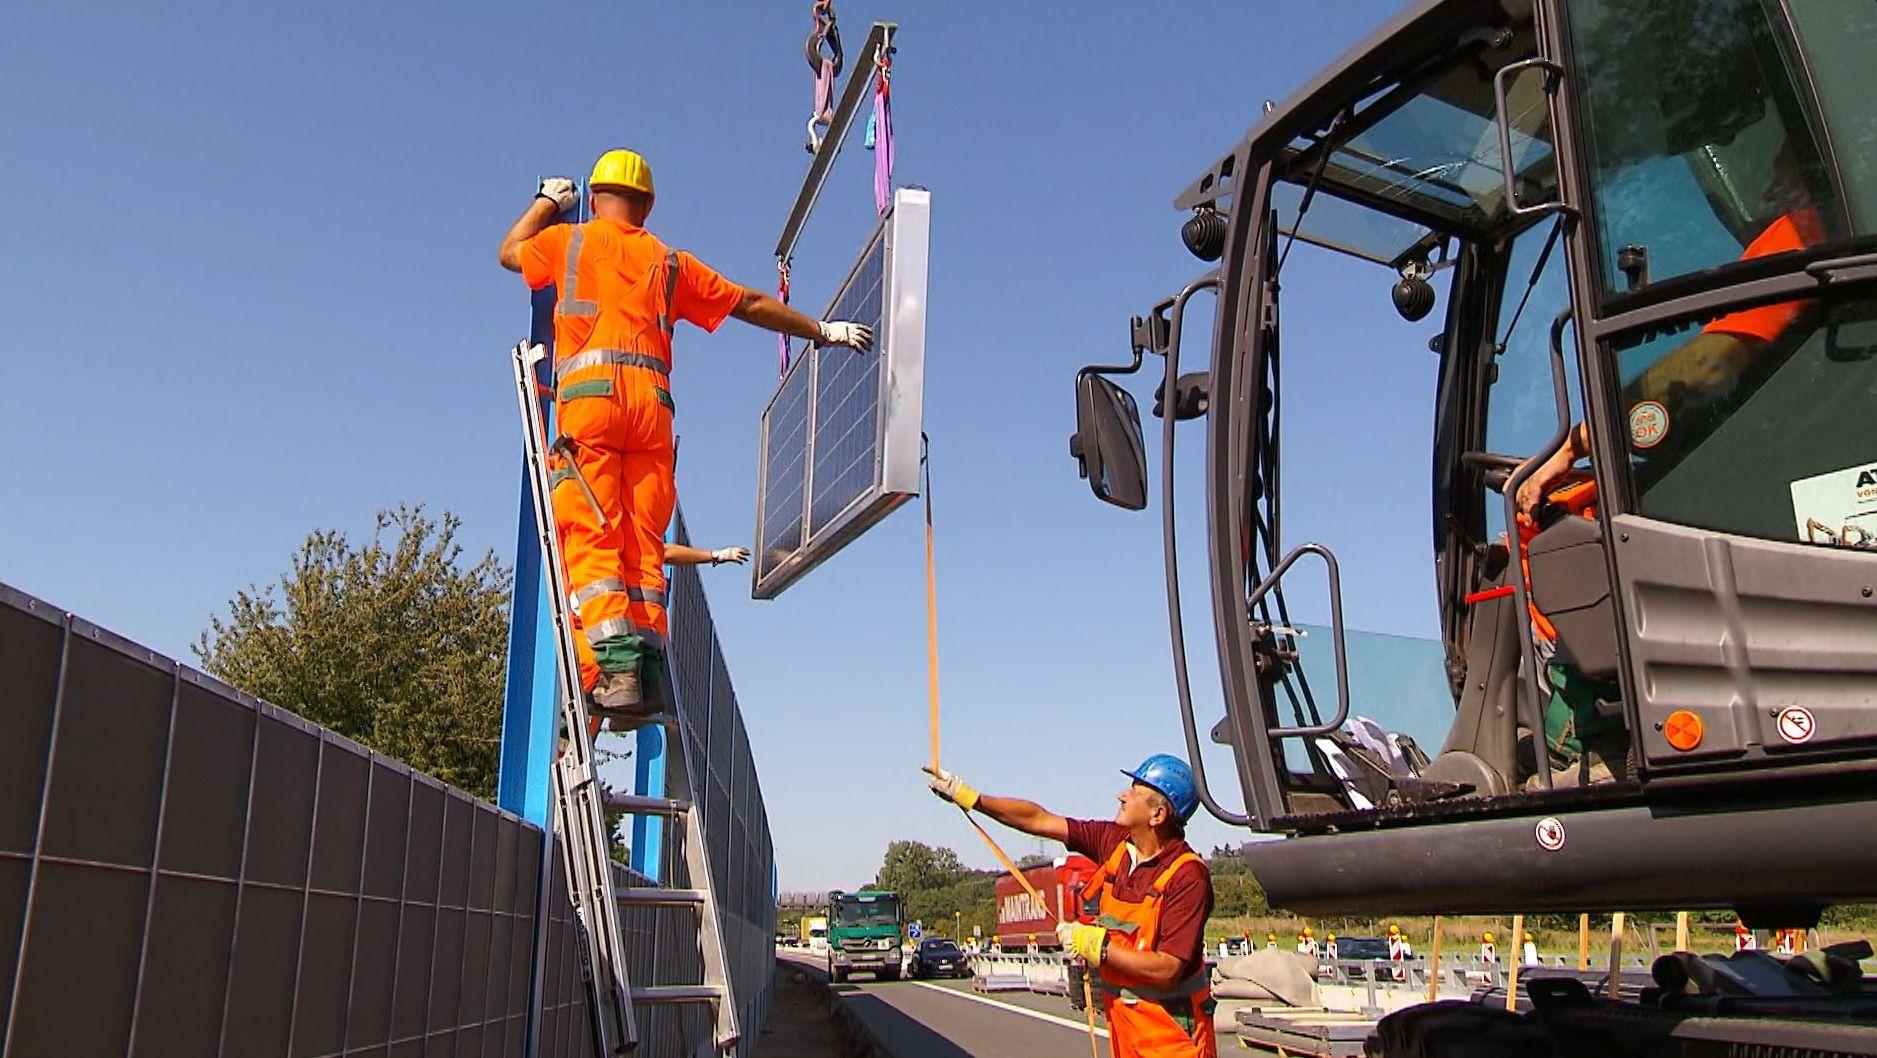 Bau der Photovoltaik-Lärmschutzwand an der A3 bei Aschaffenburg